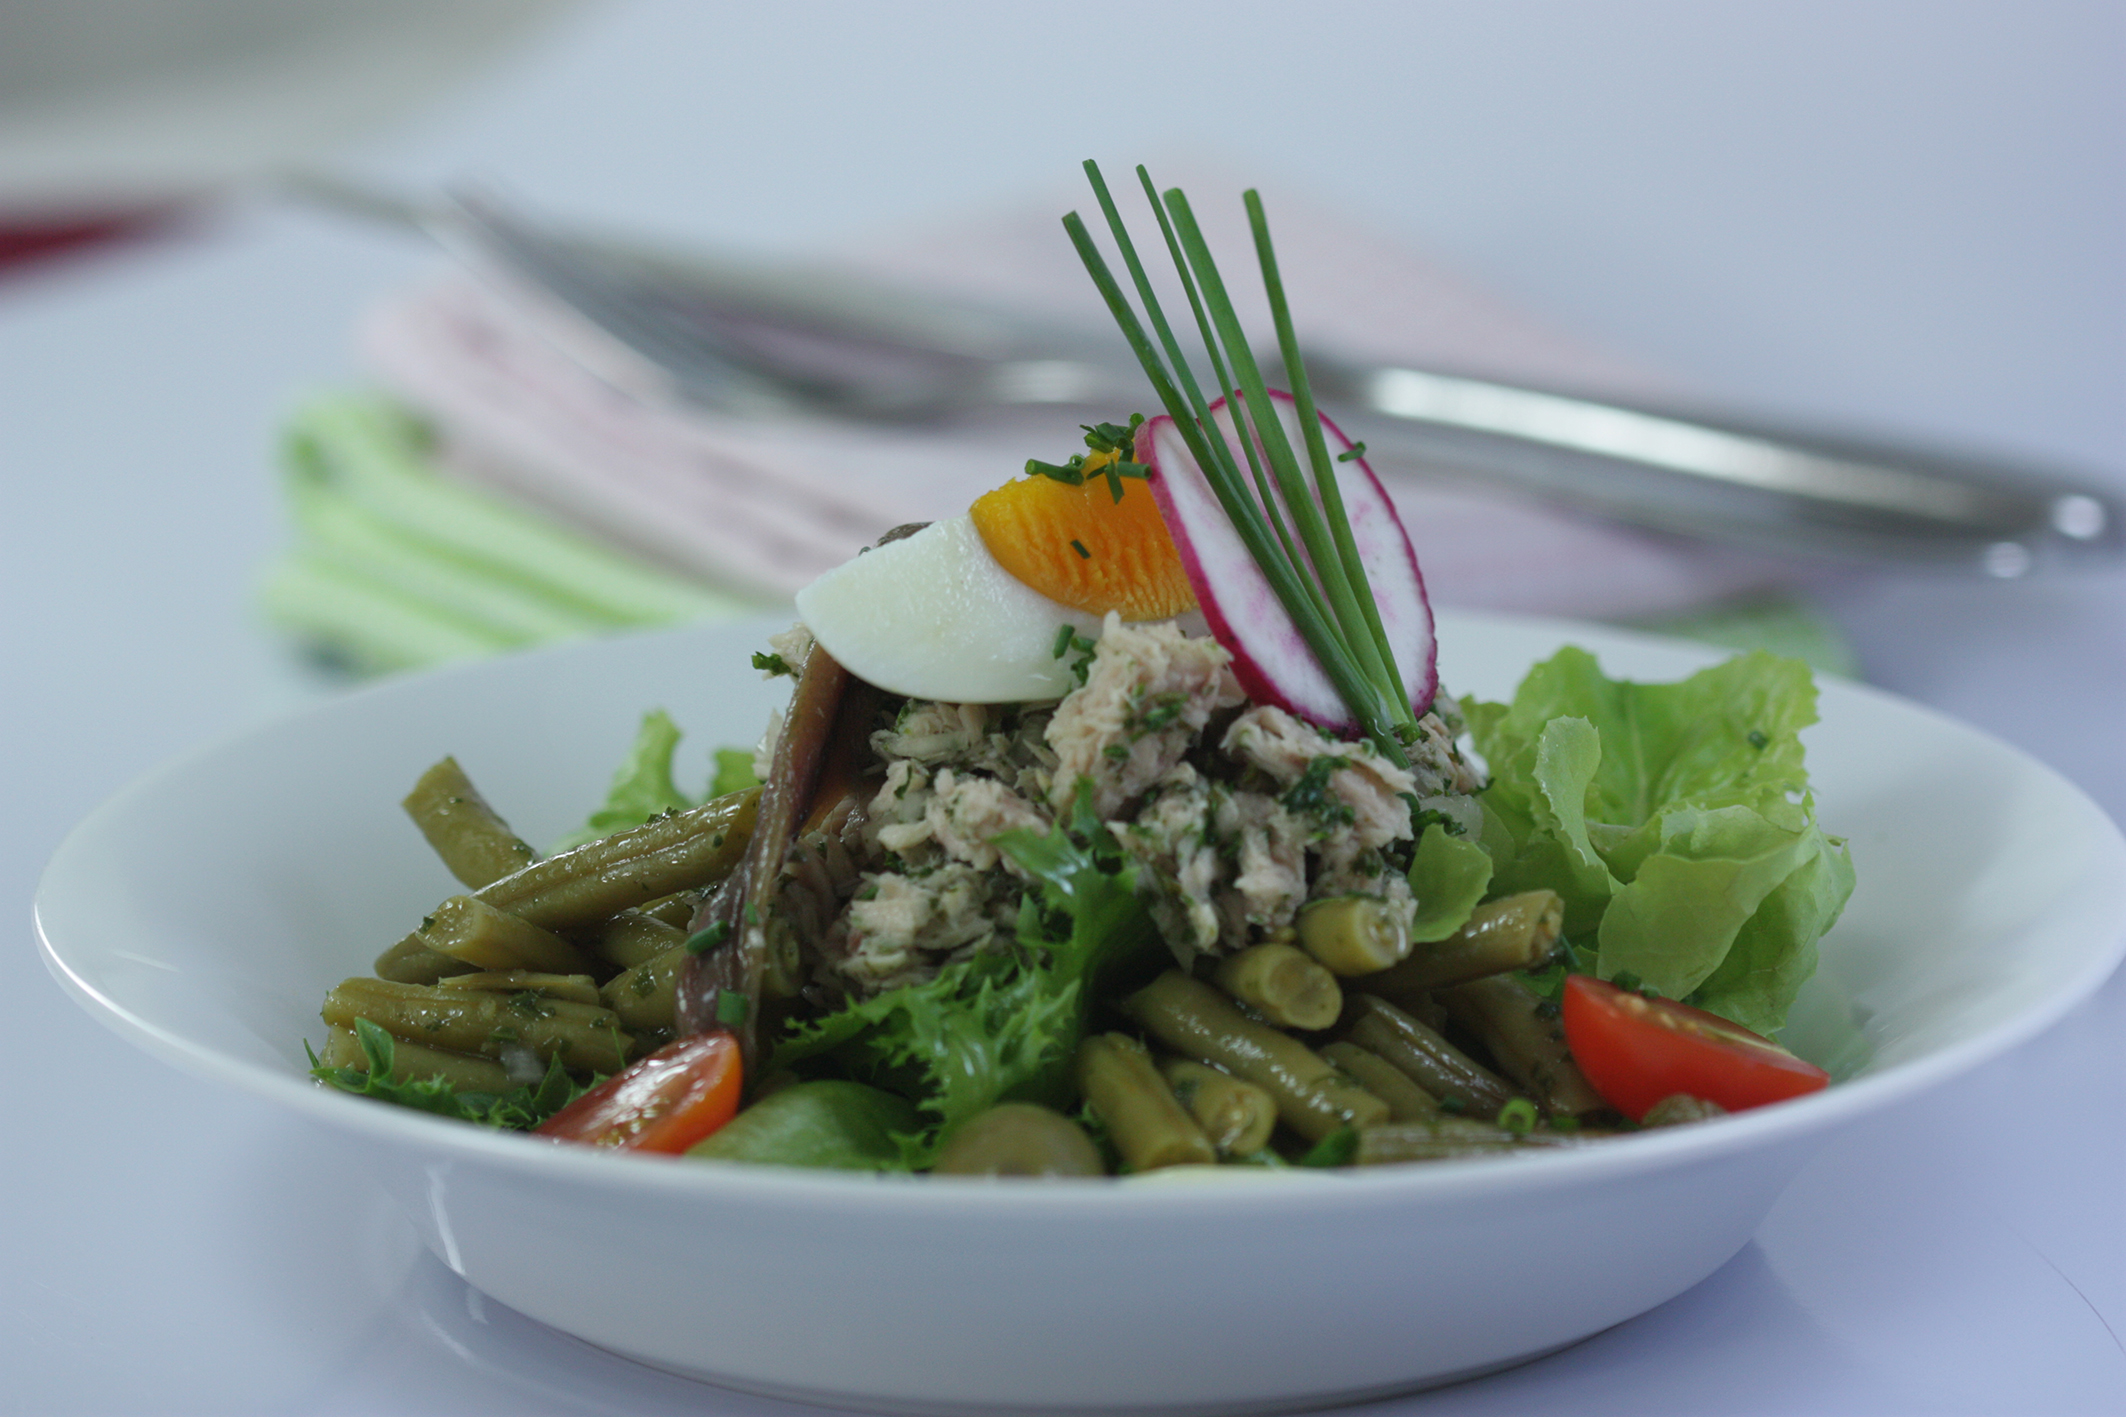 nichoise salad